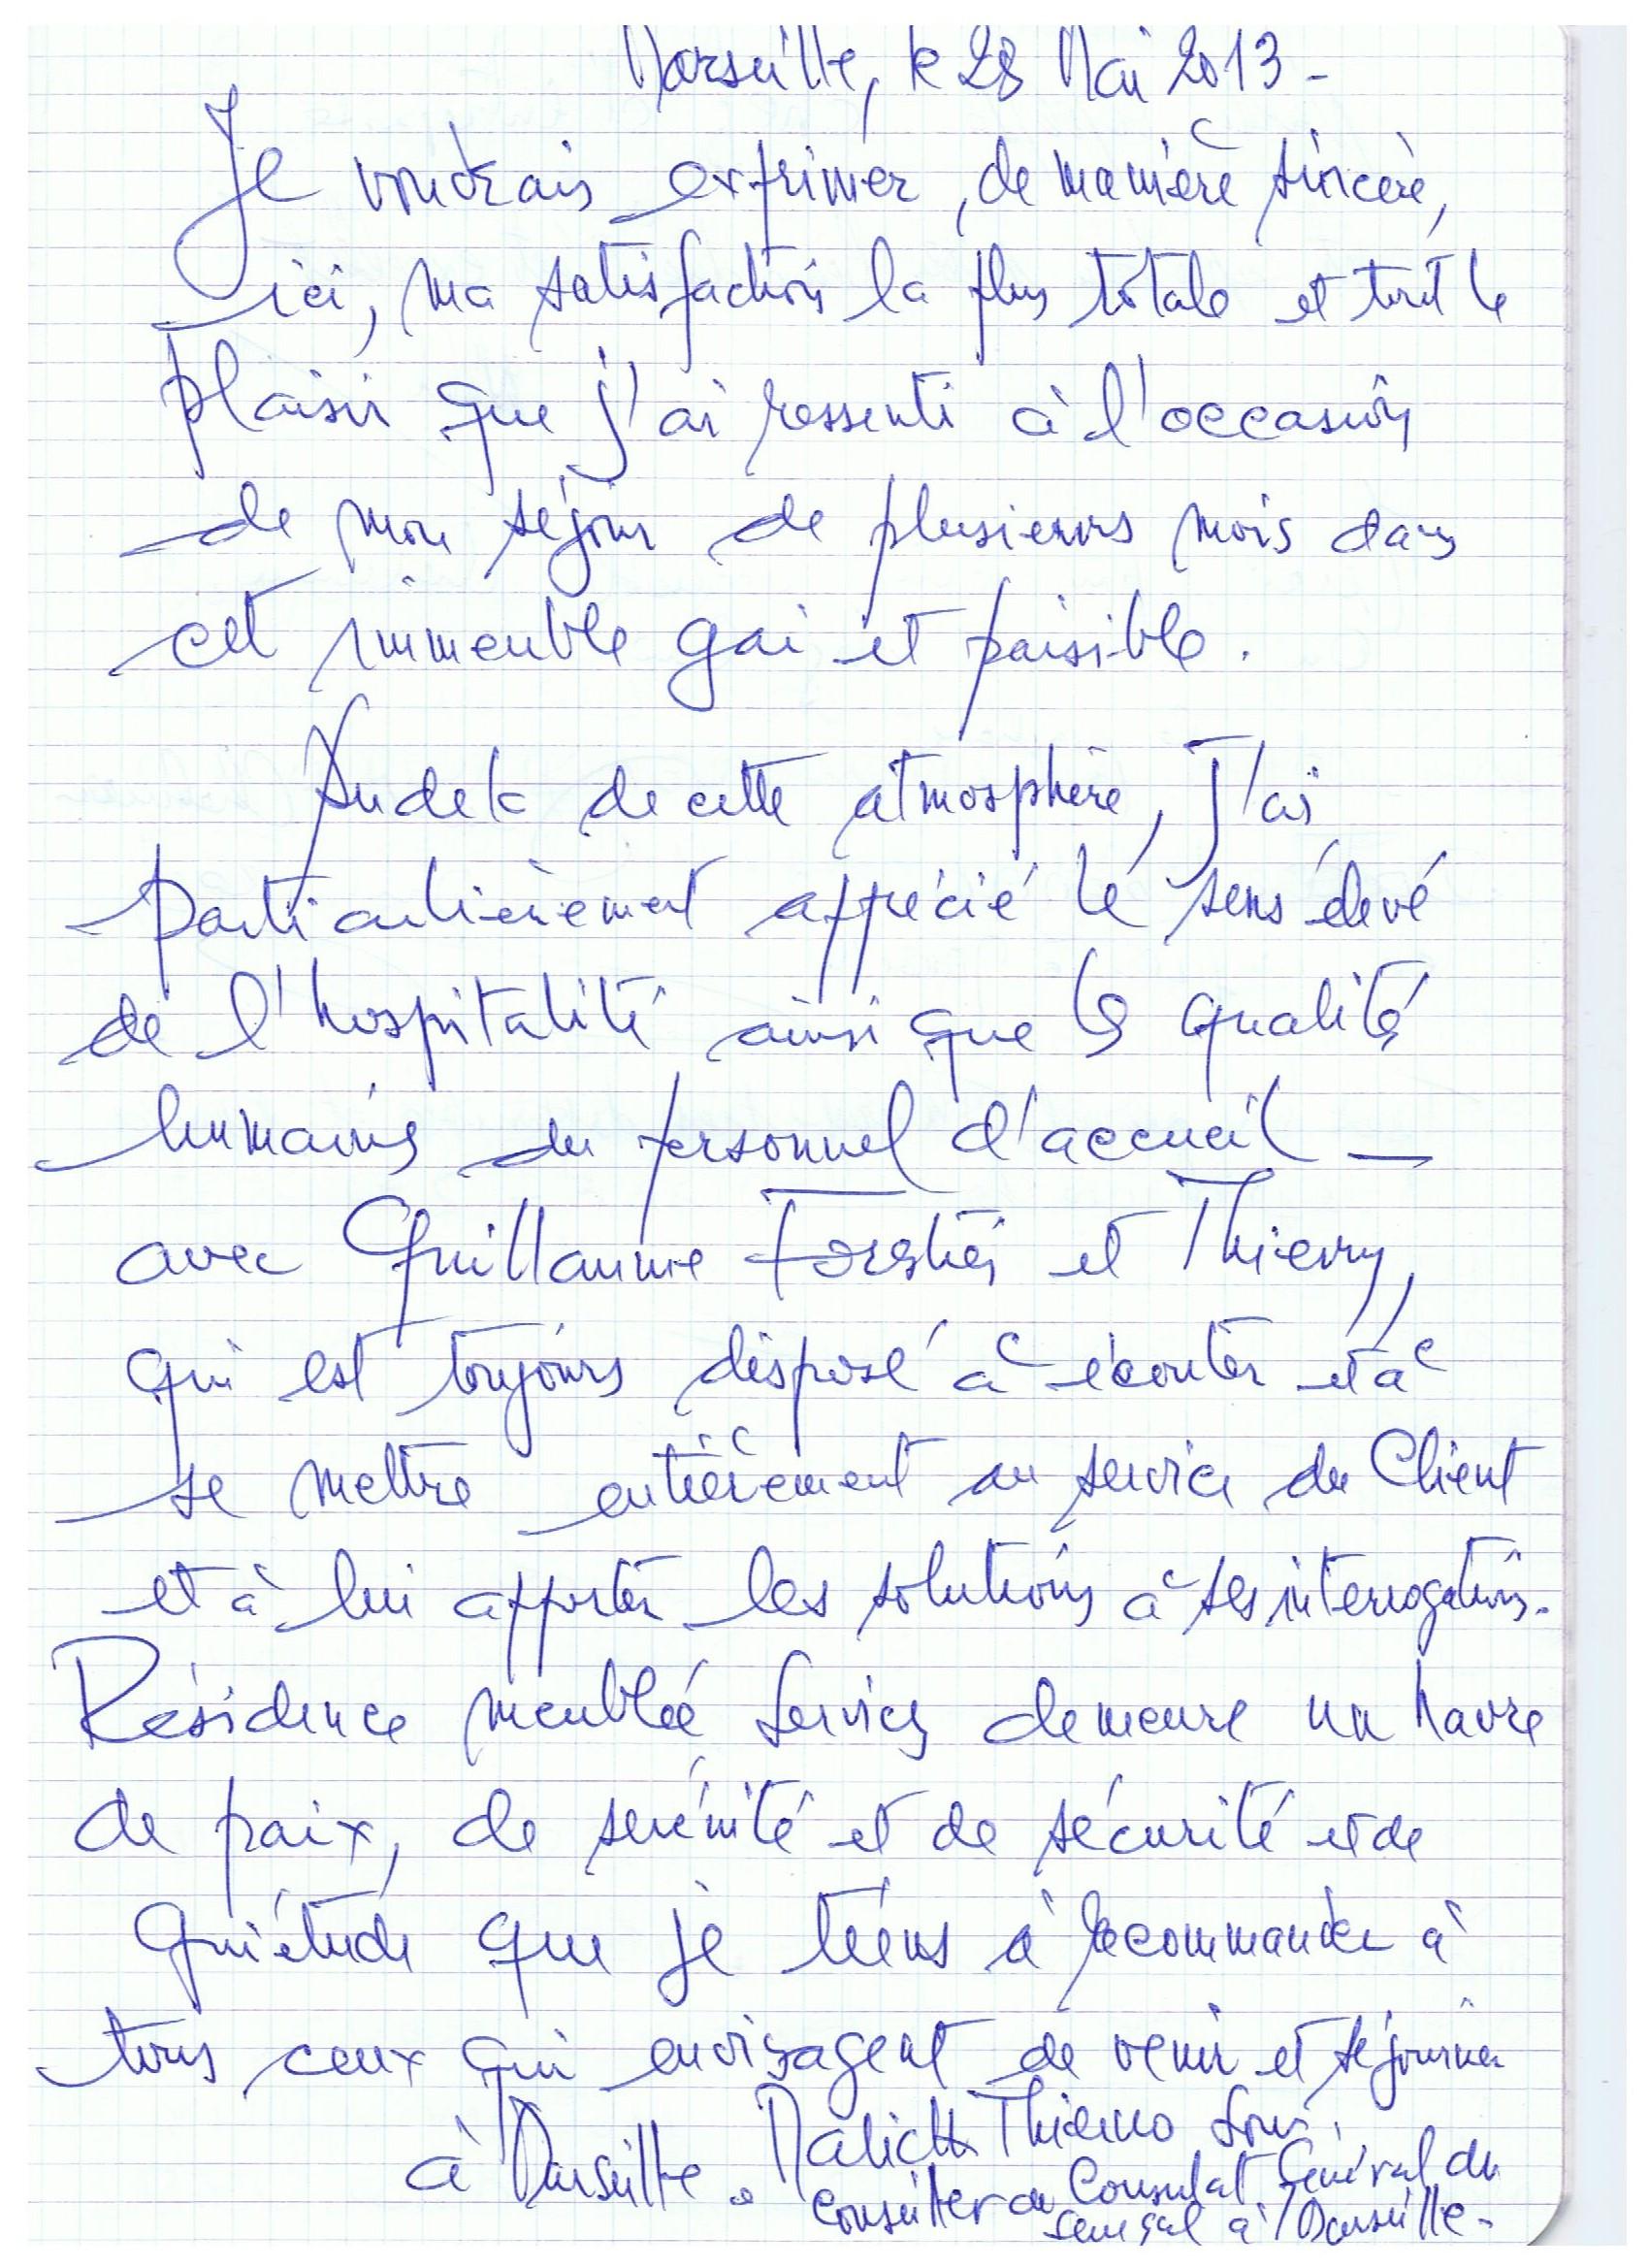 Livre d'or Résidence p1 001.jpg